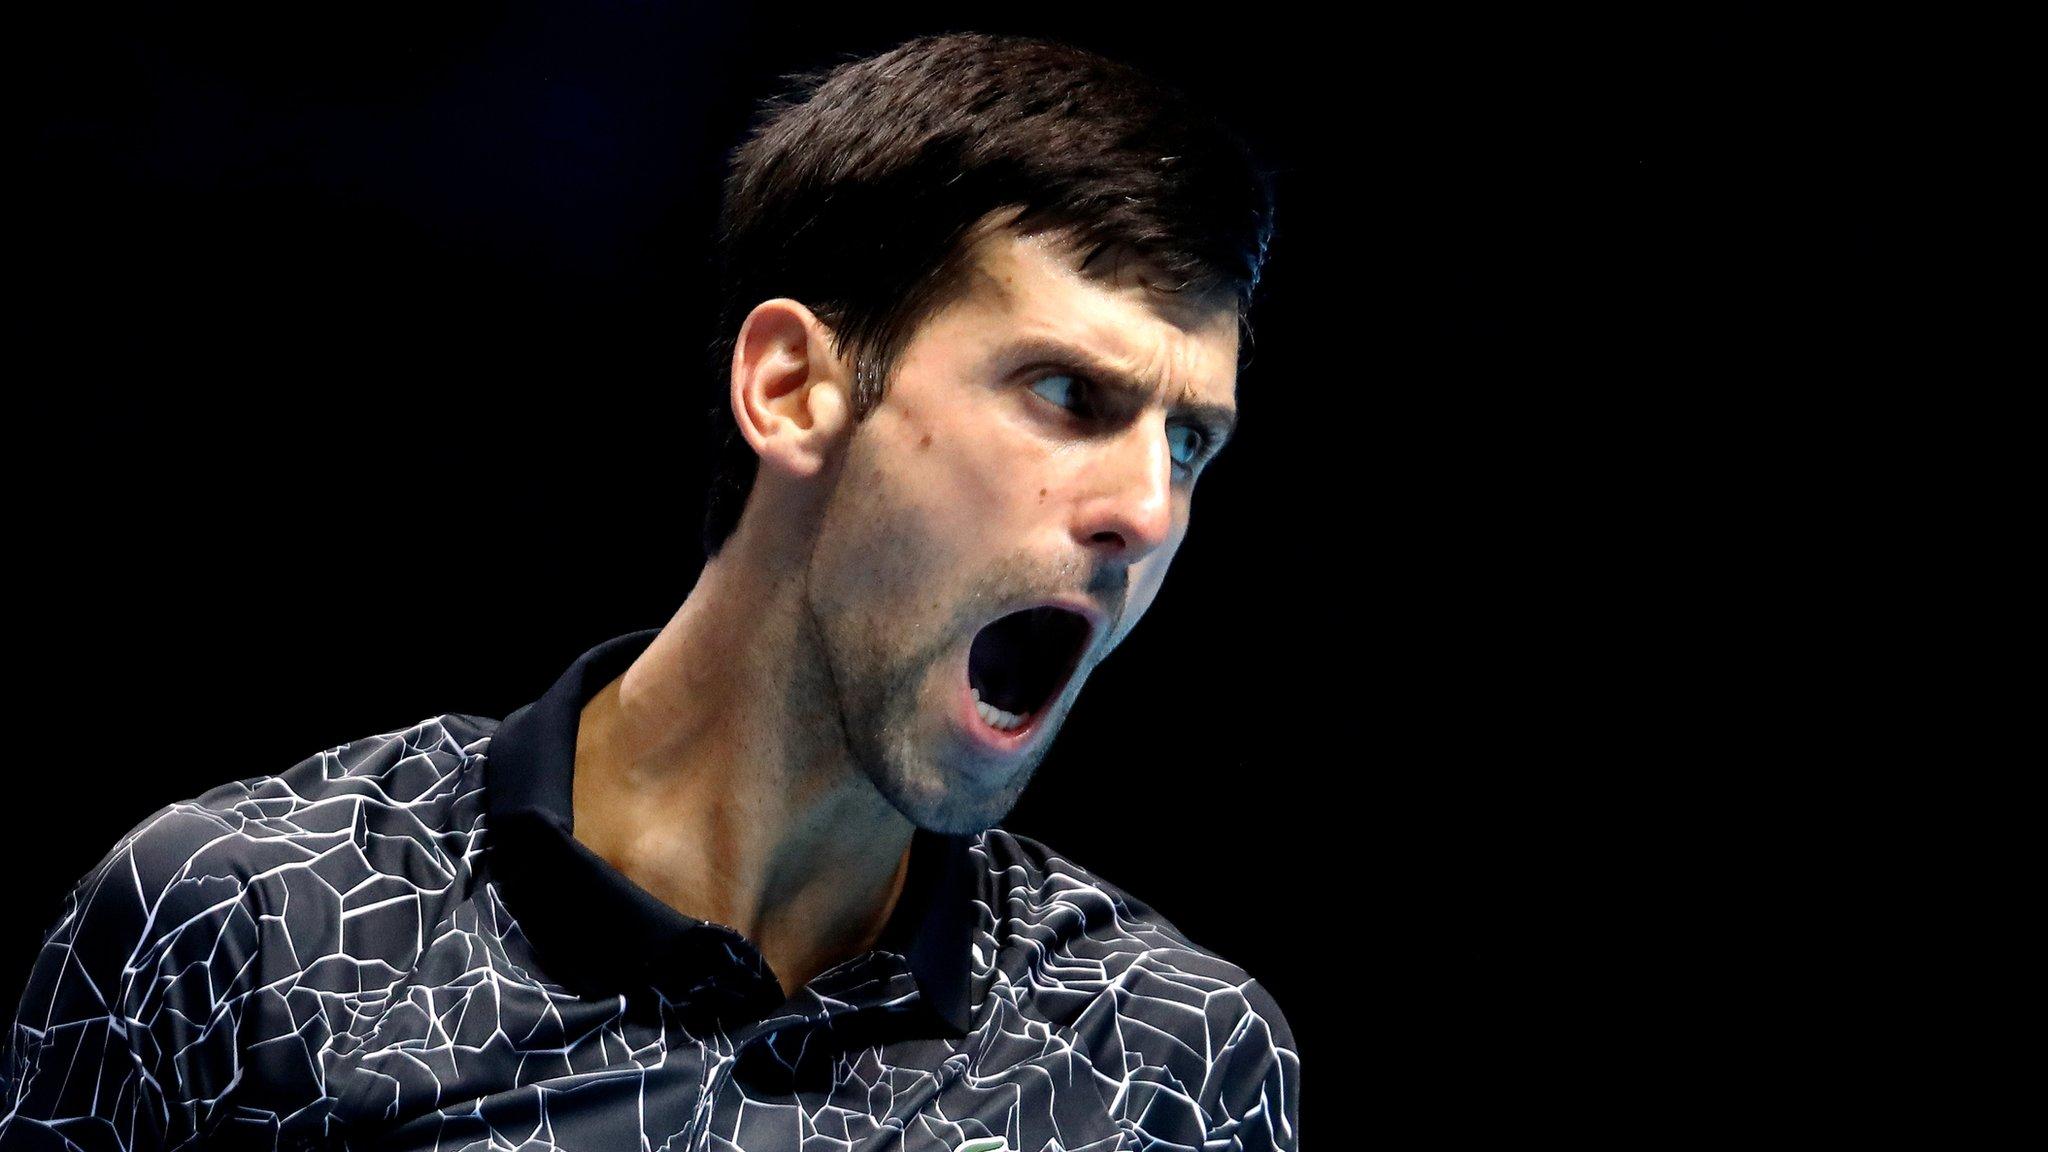 Djokovic through to semi-finals as Cilic beats Isner